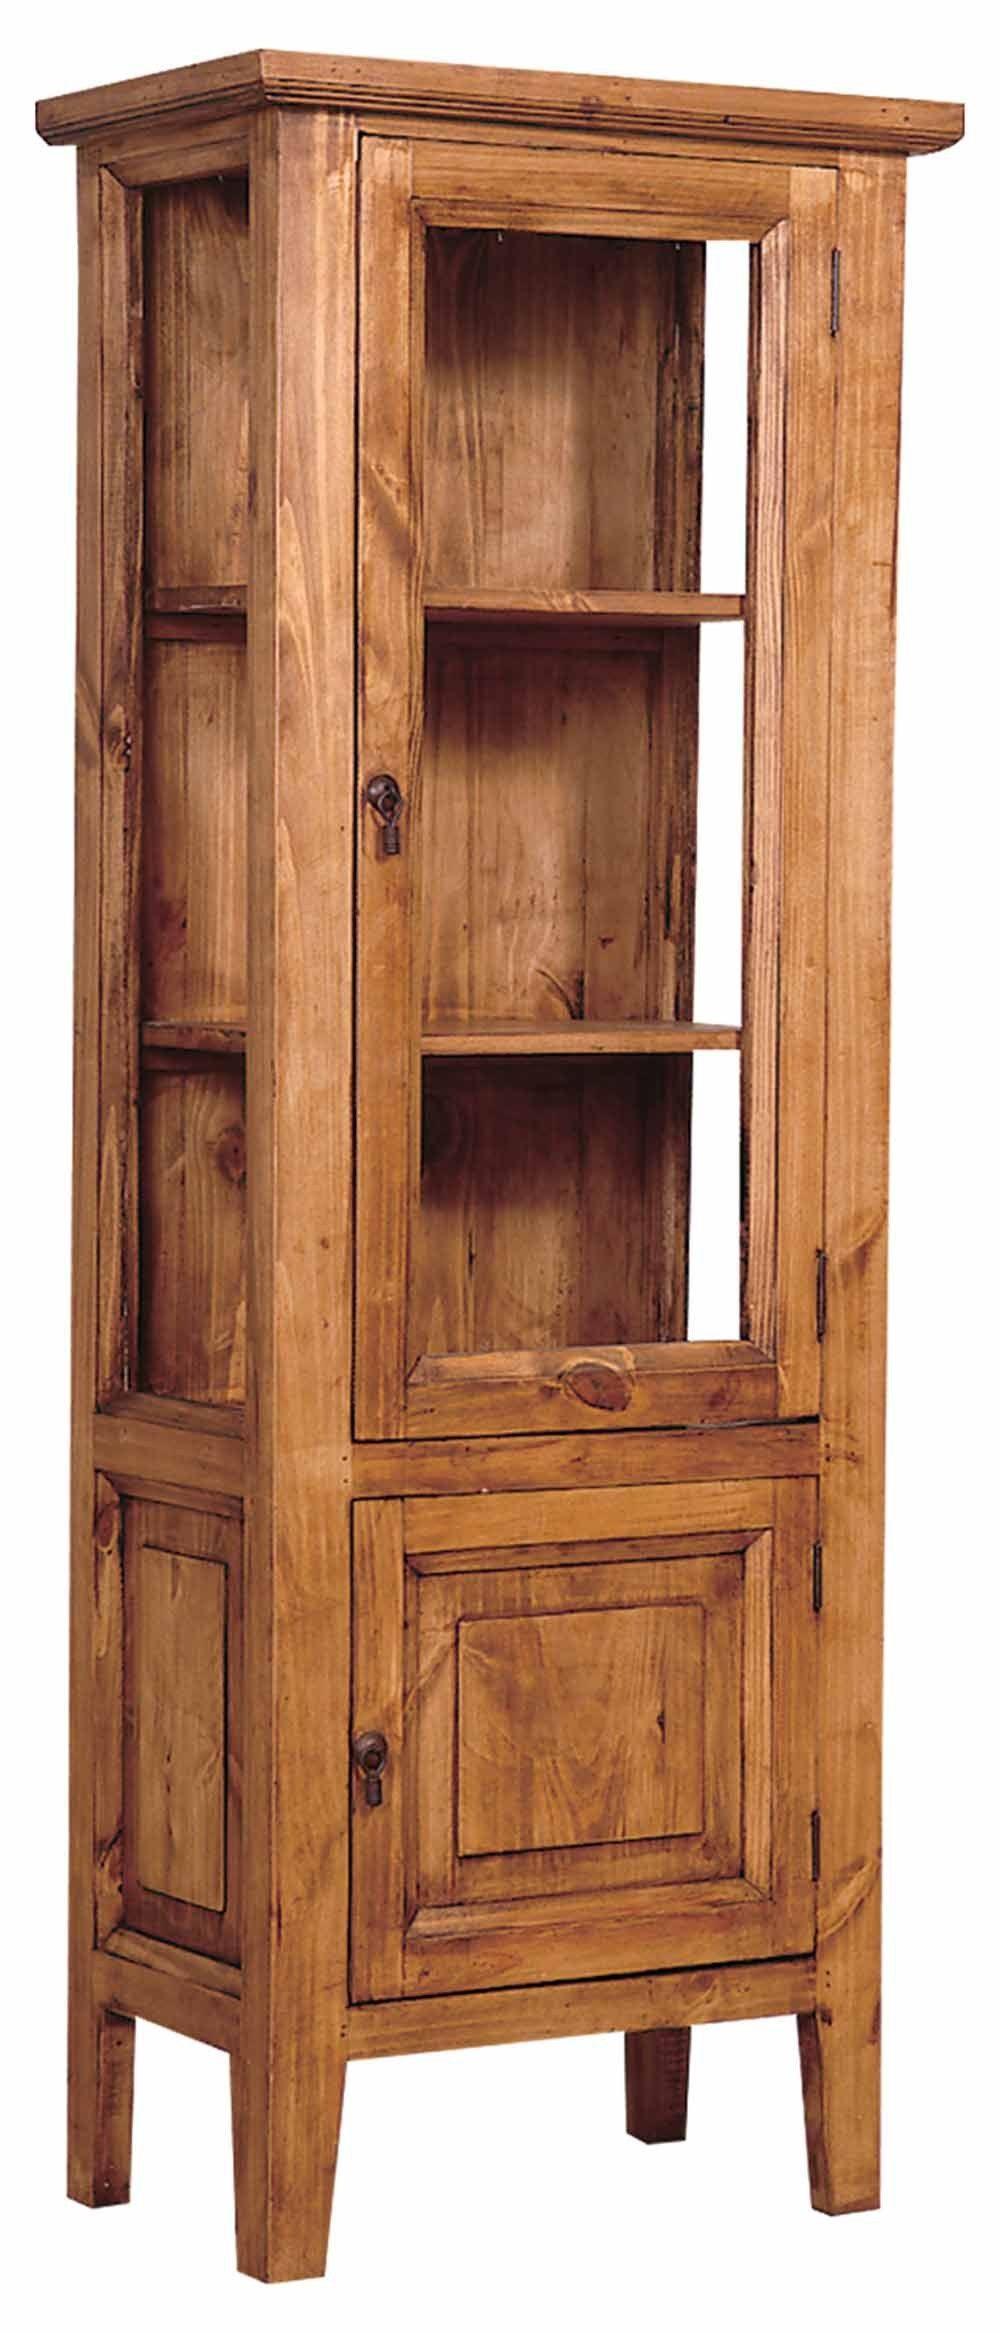 Rustic pine curio cabinet rusticpinefurniture furniture for Curio cabinet